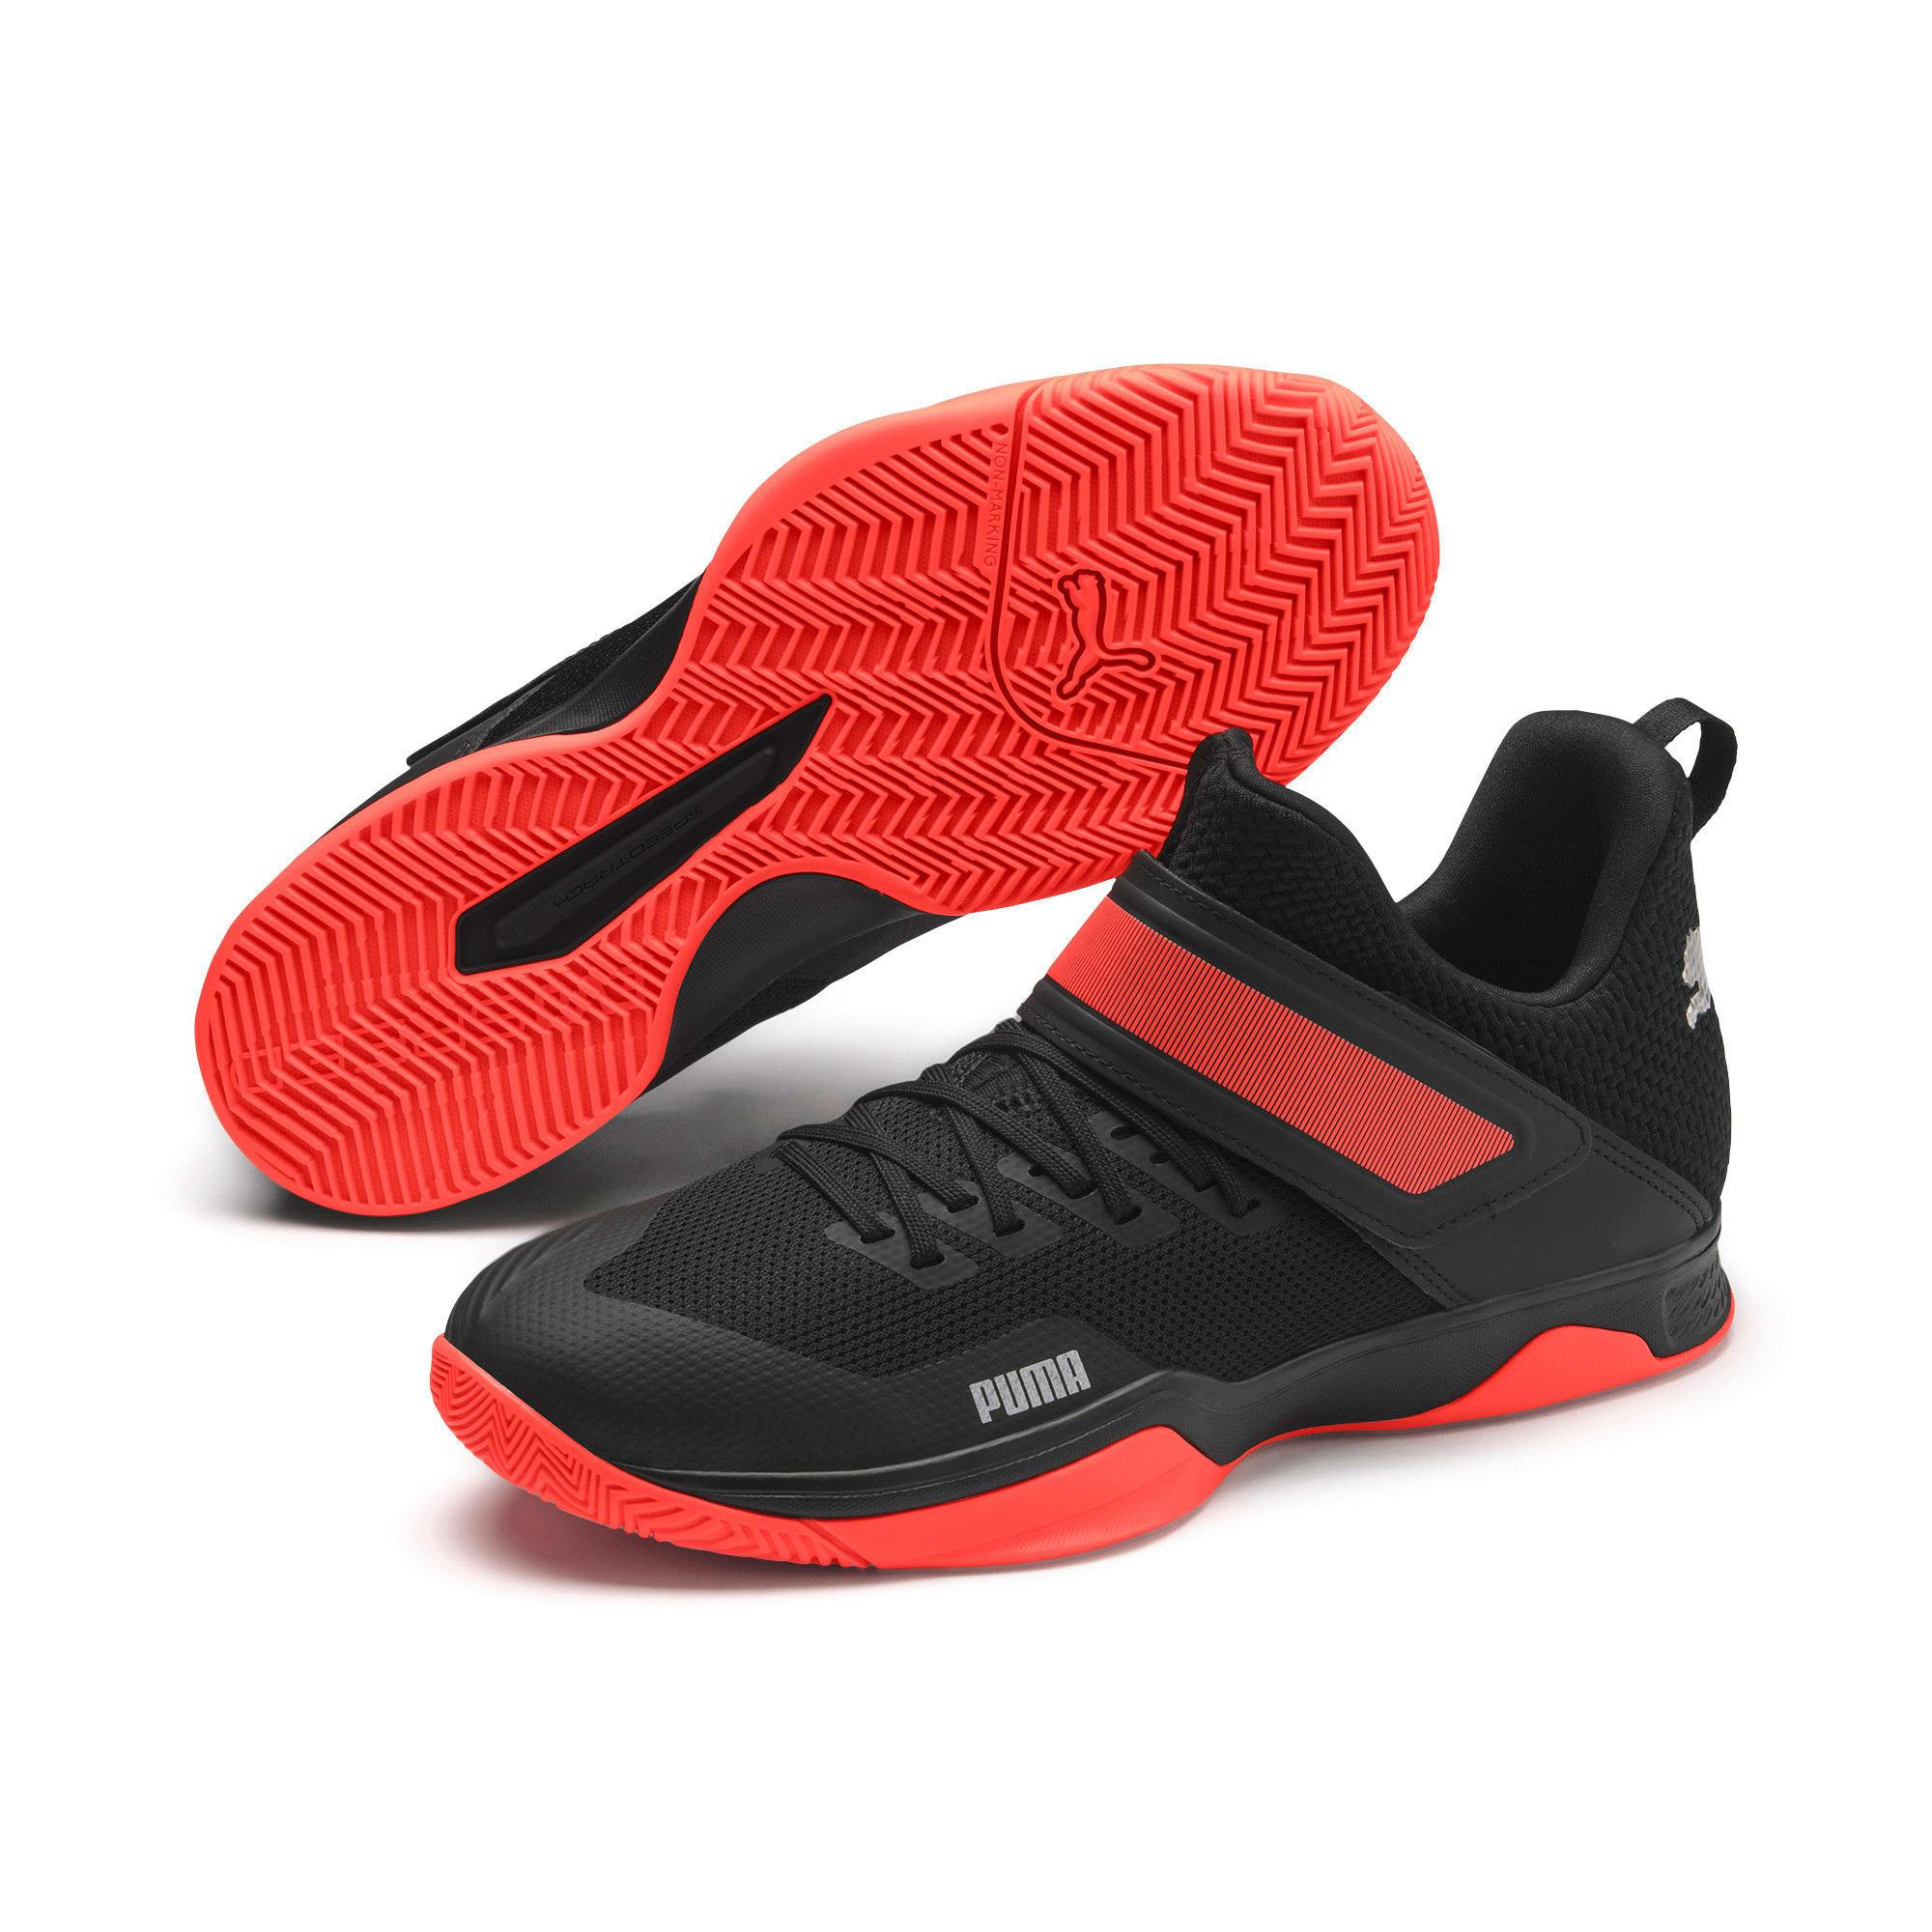 Thumbnail 3 of Rise XT3 Handball Shoes, Puma Black-Silver-Nrgy Red, medium